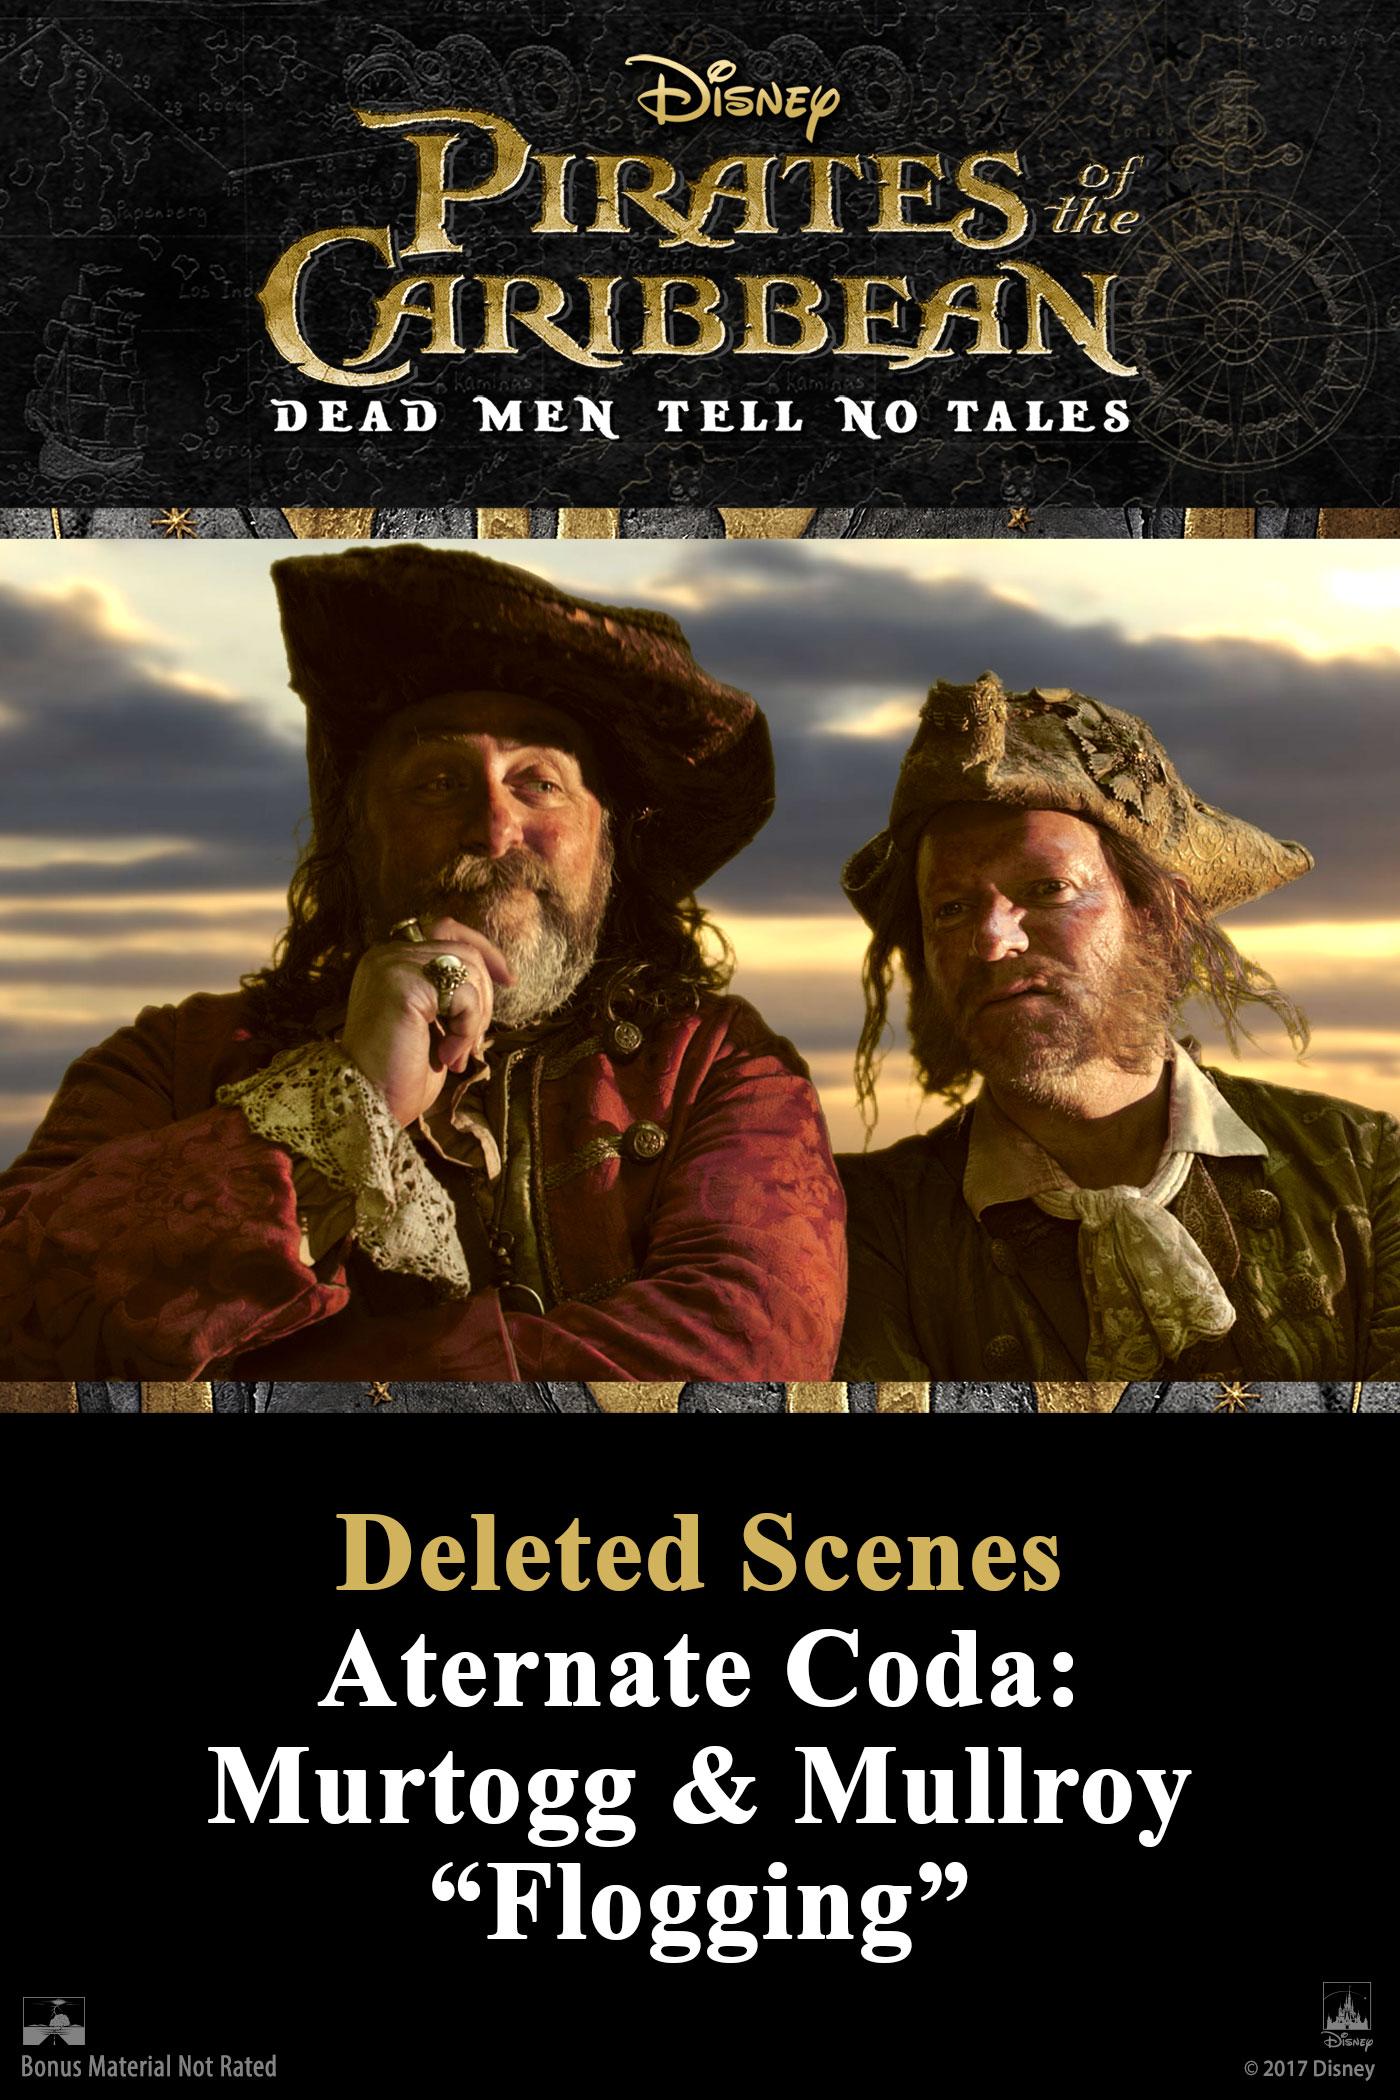 "Deleted Scene - Alternate Coda: Murtogg & Mullroy ""Flogging"""